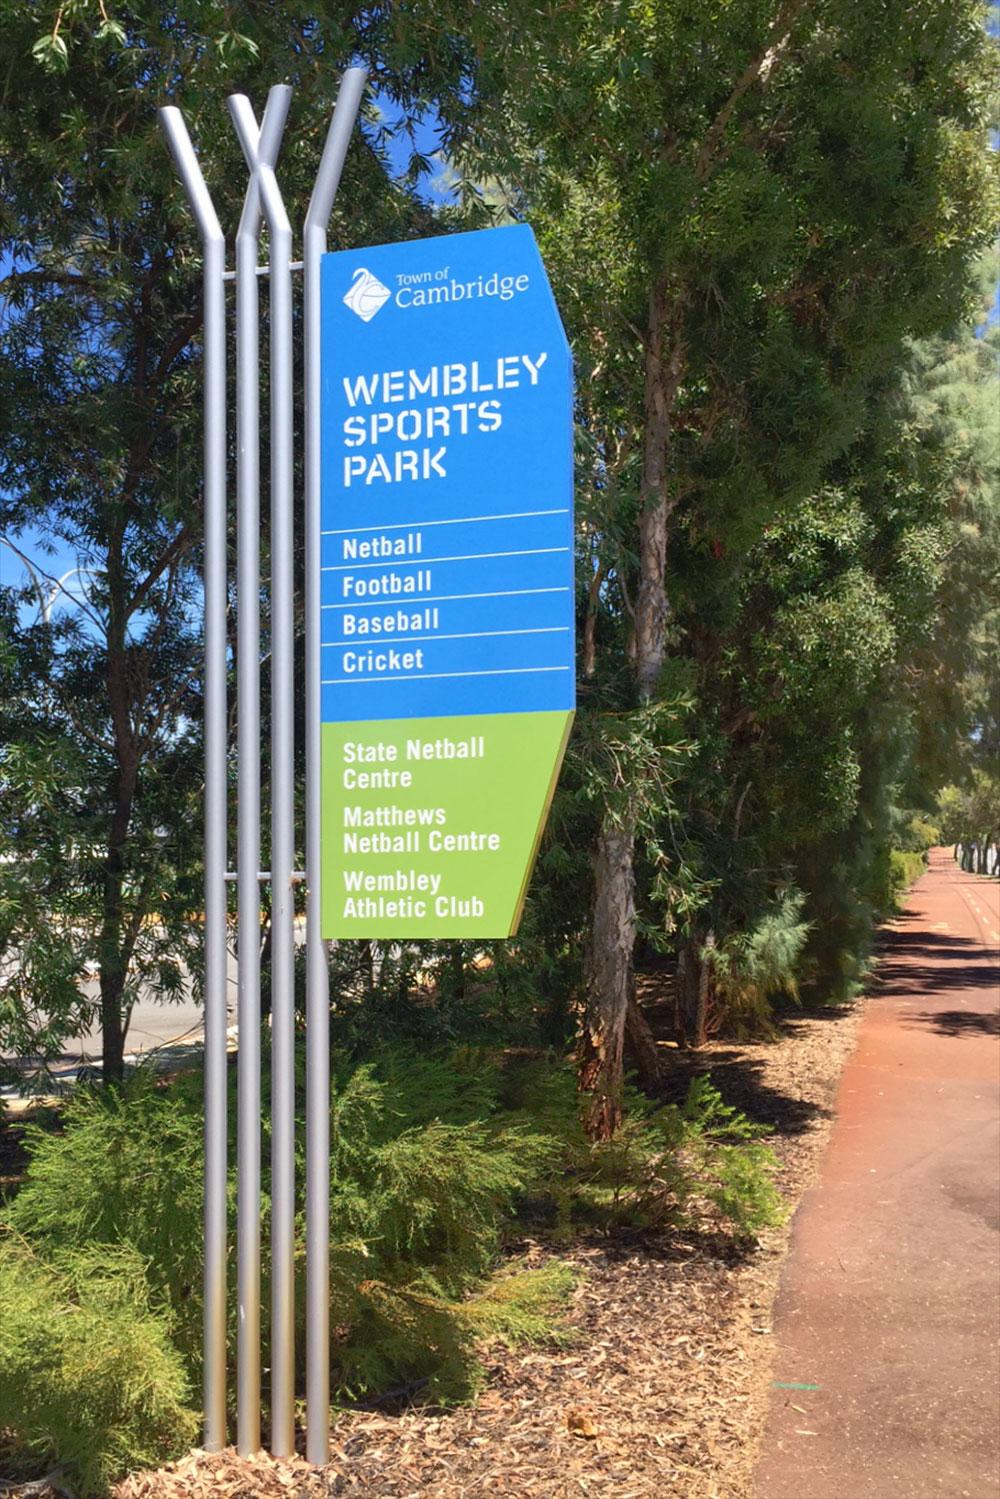 Wembley Sports Park – Signage